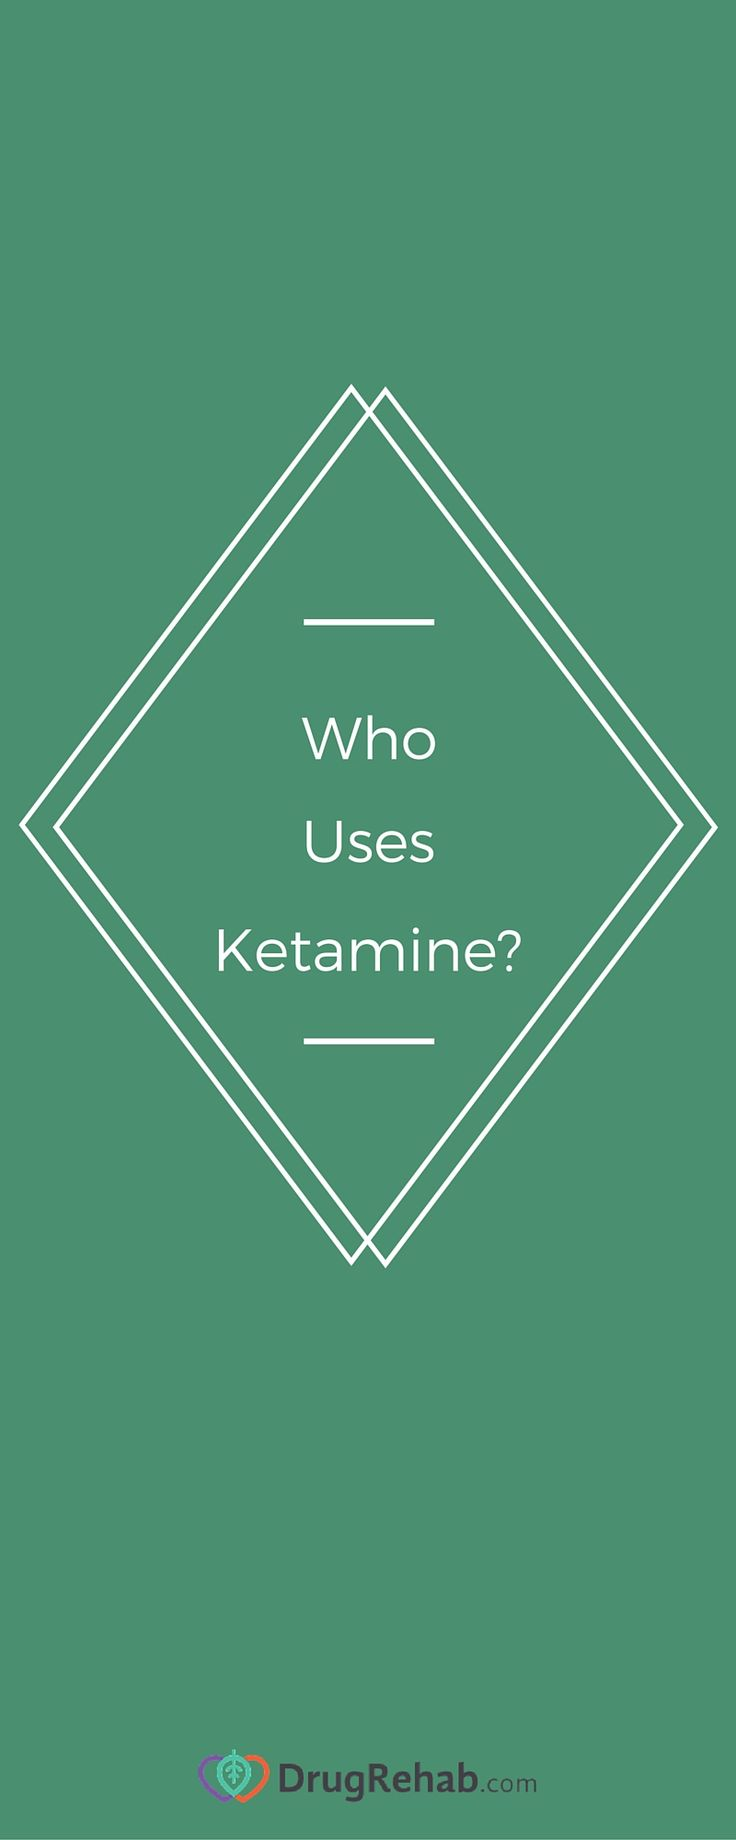 Causes of ketamine addiction